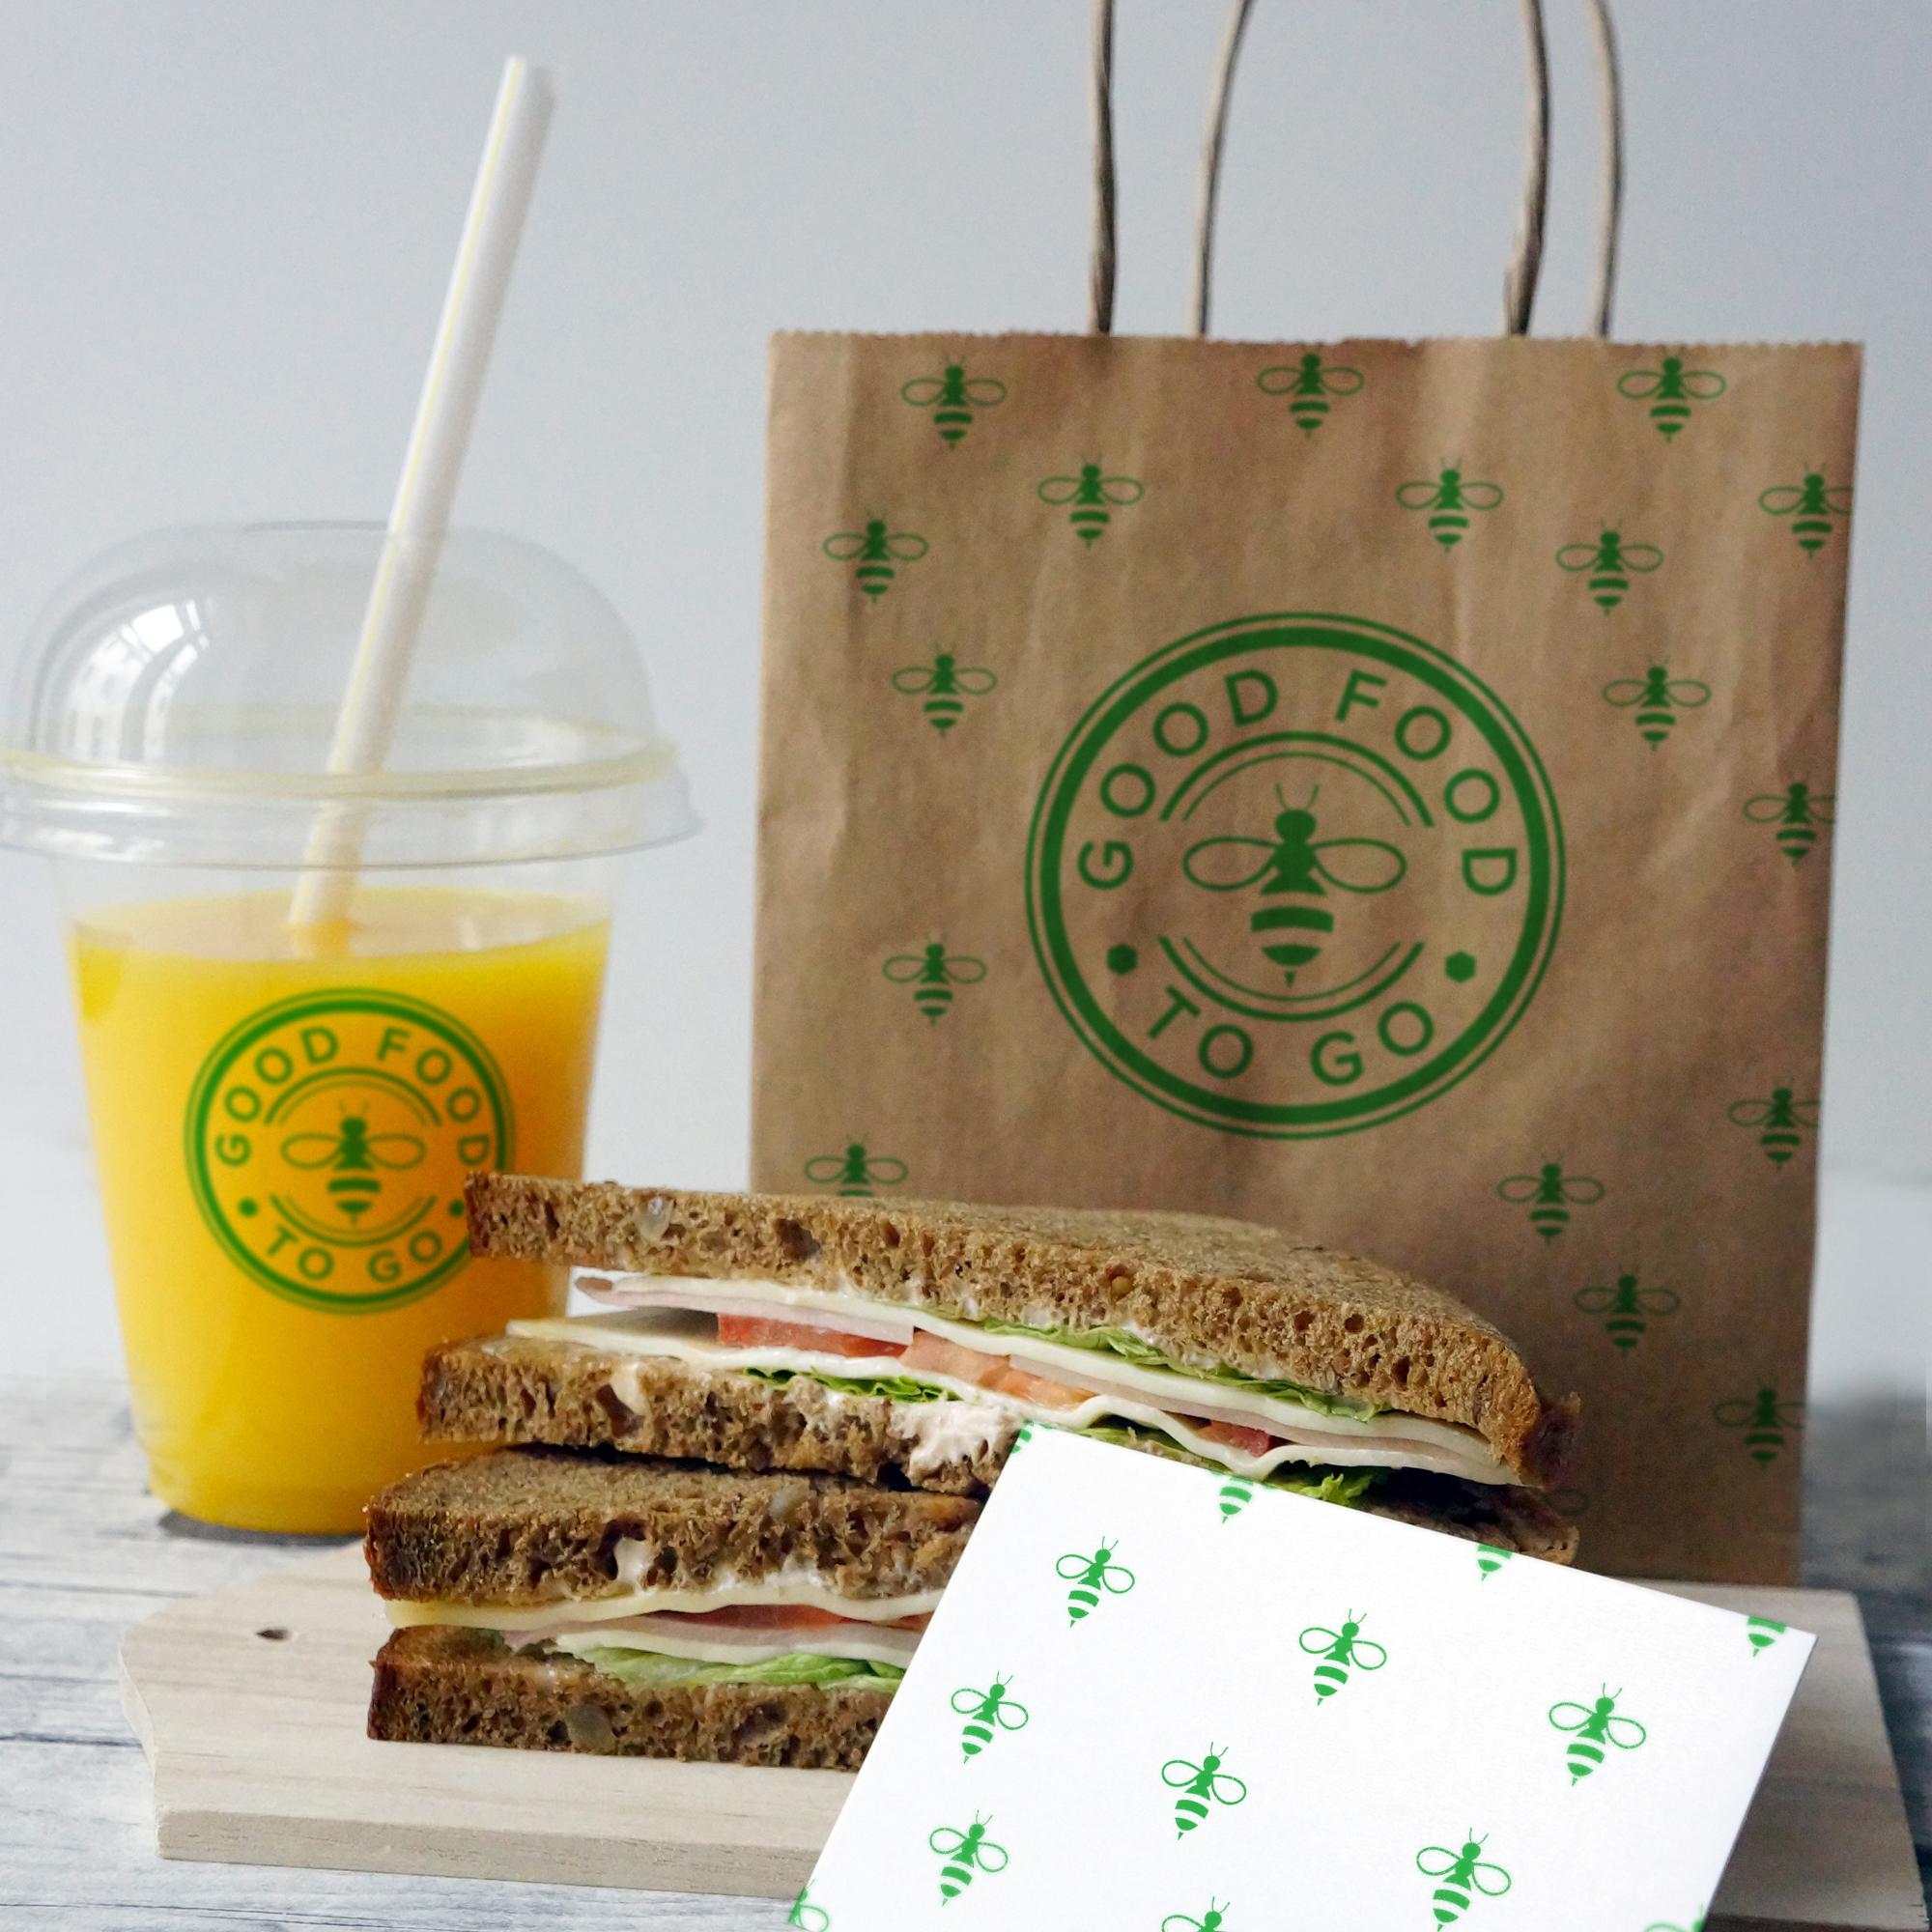 Good-Food-To-Go-Cafe-Marketing-branding-sandwich-bag-logo-design.jpg